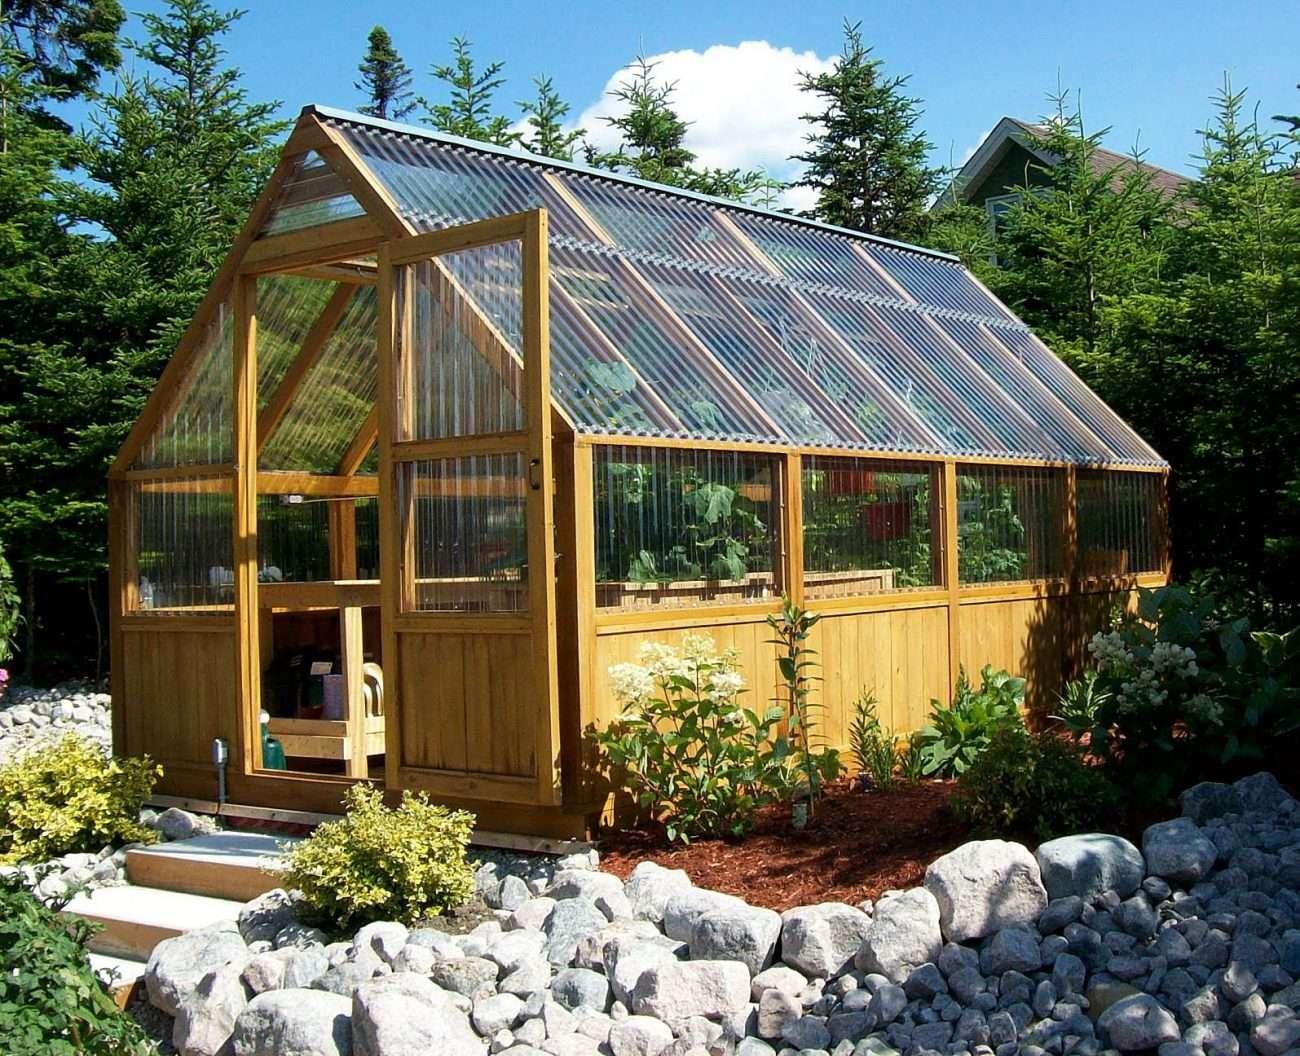 Build Diy Greenhouse Theydesign